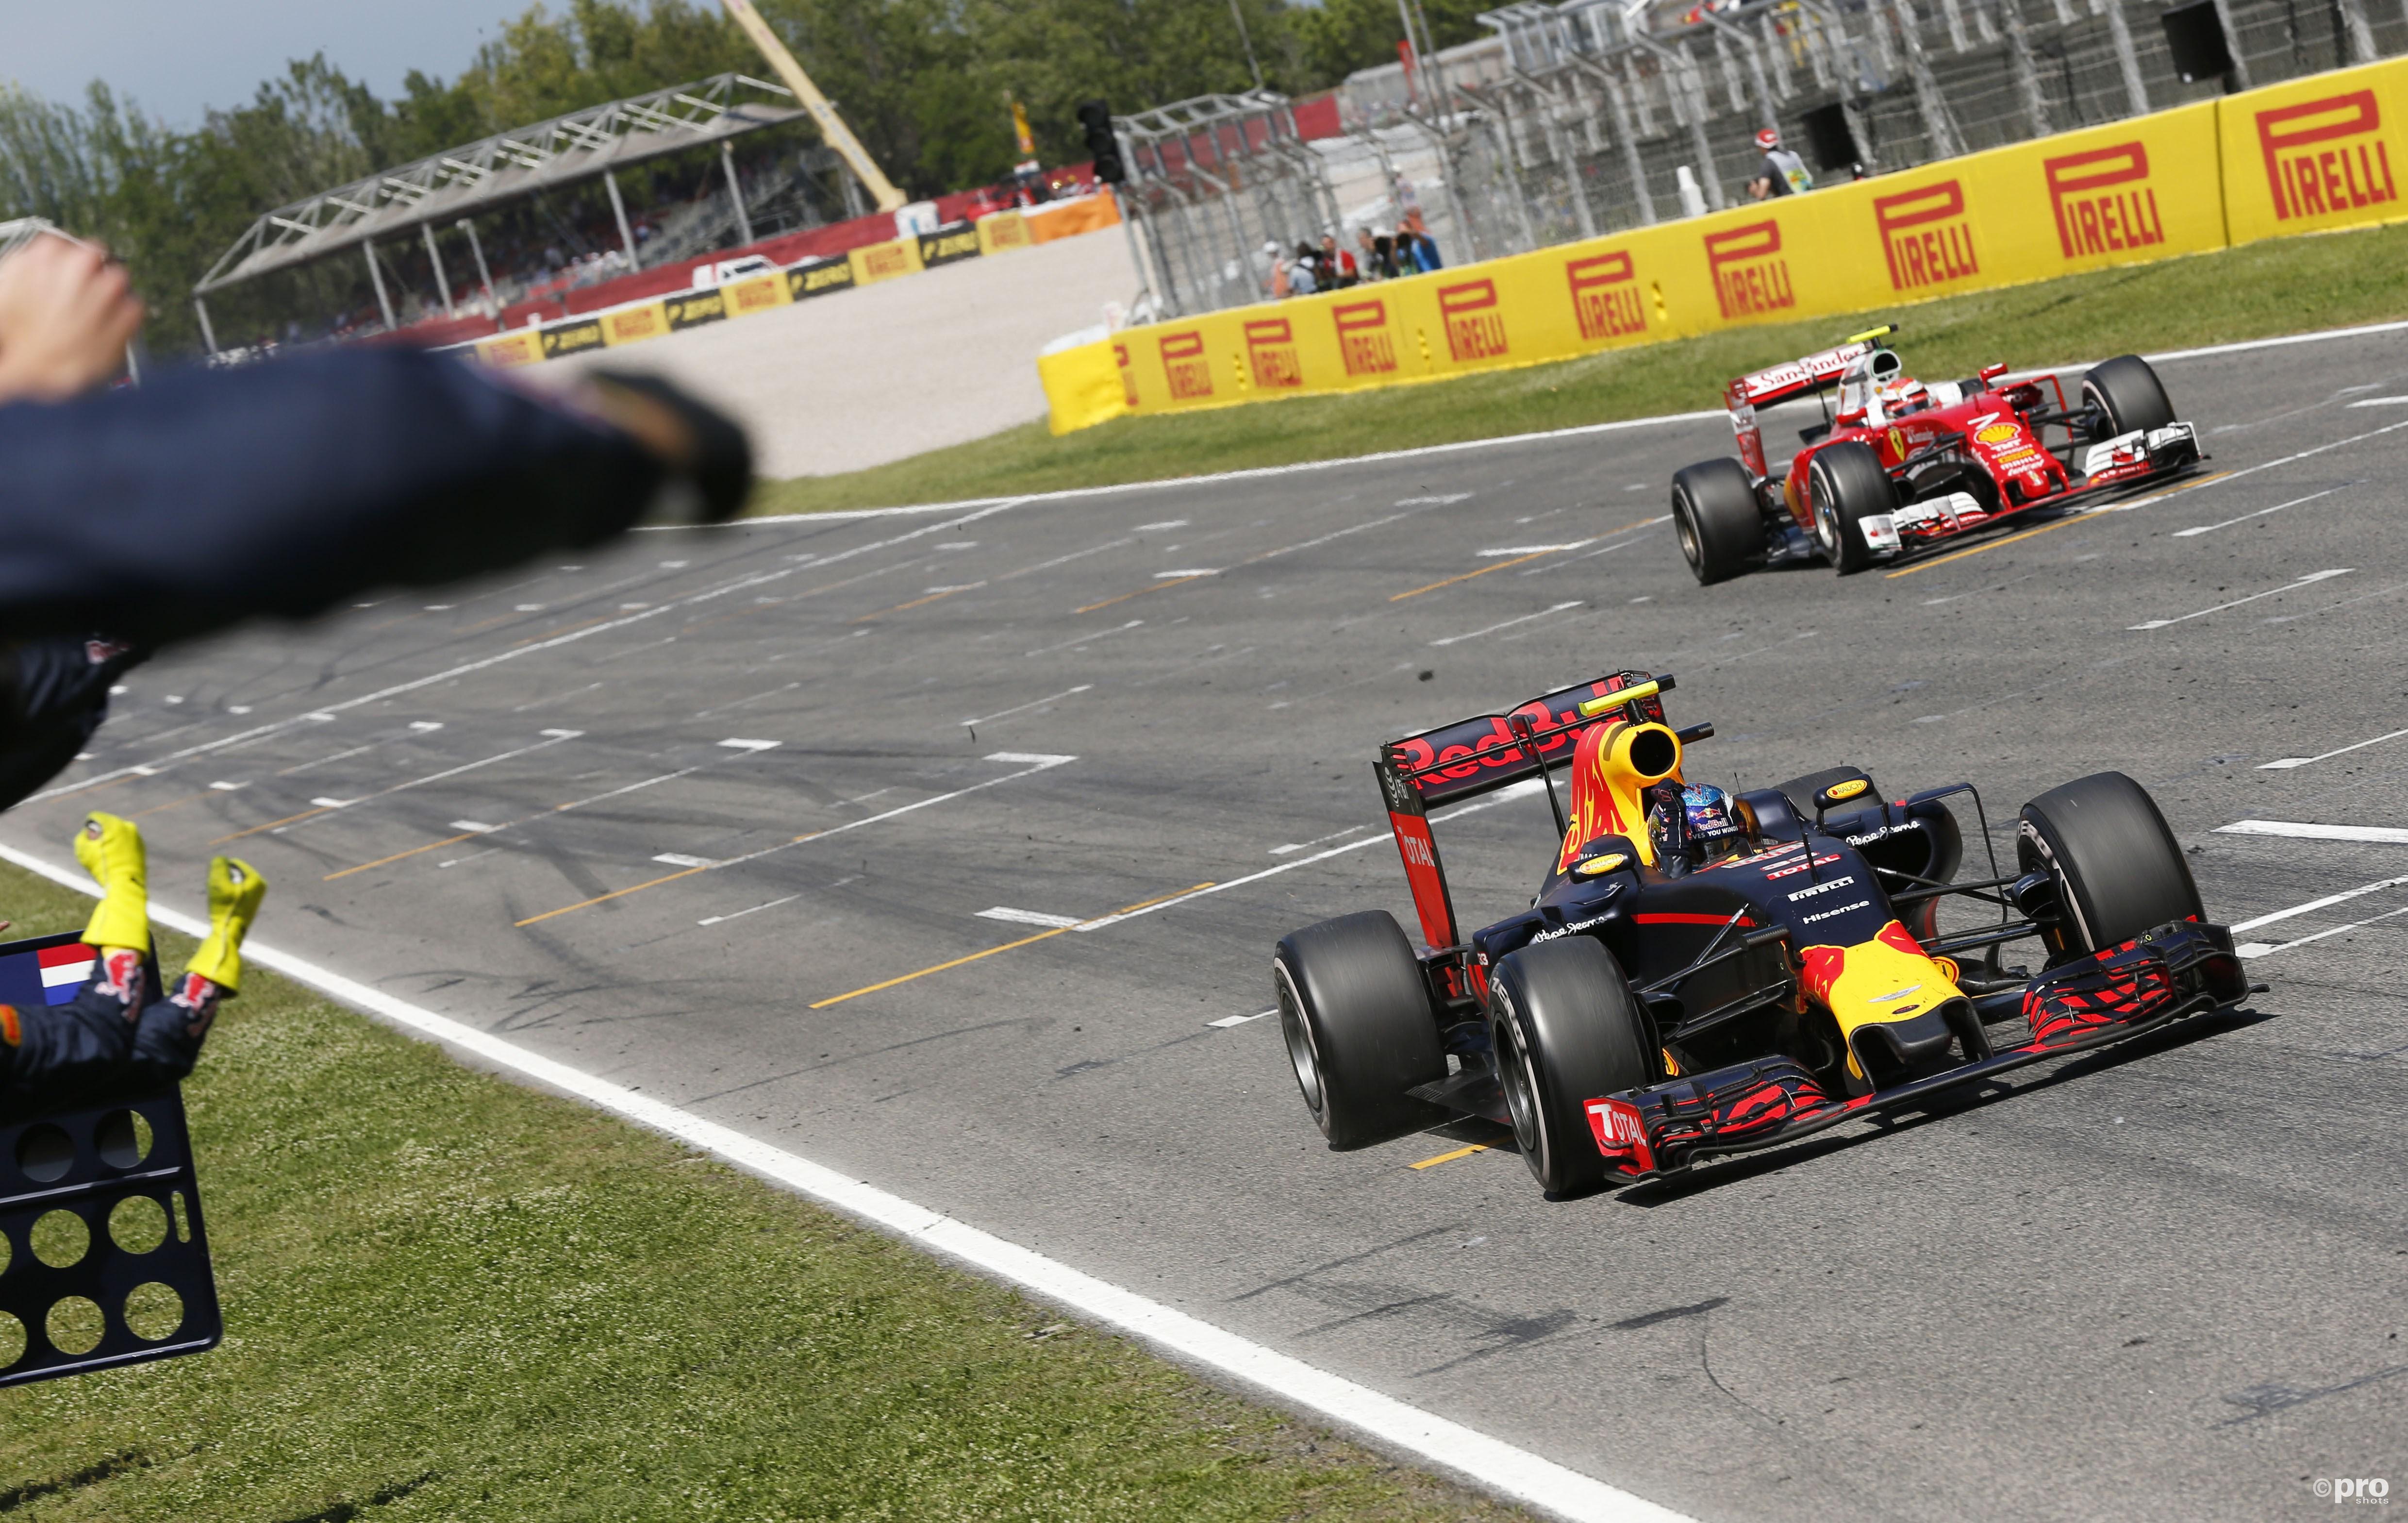 'Wie won de Grand Prix van Spanje?' was helaas geen quizvraag..(PROSHOTS/Zuma Sports Wire)